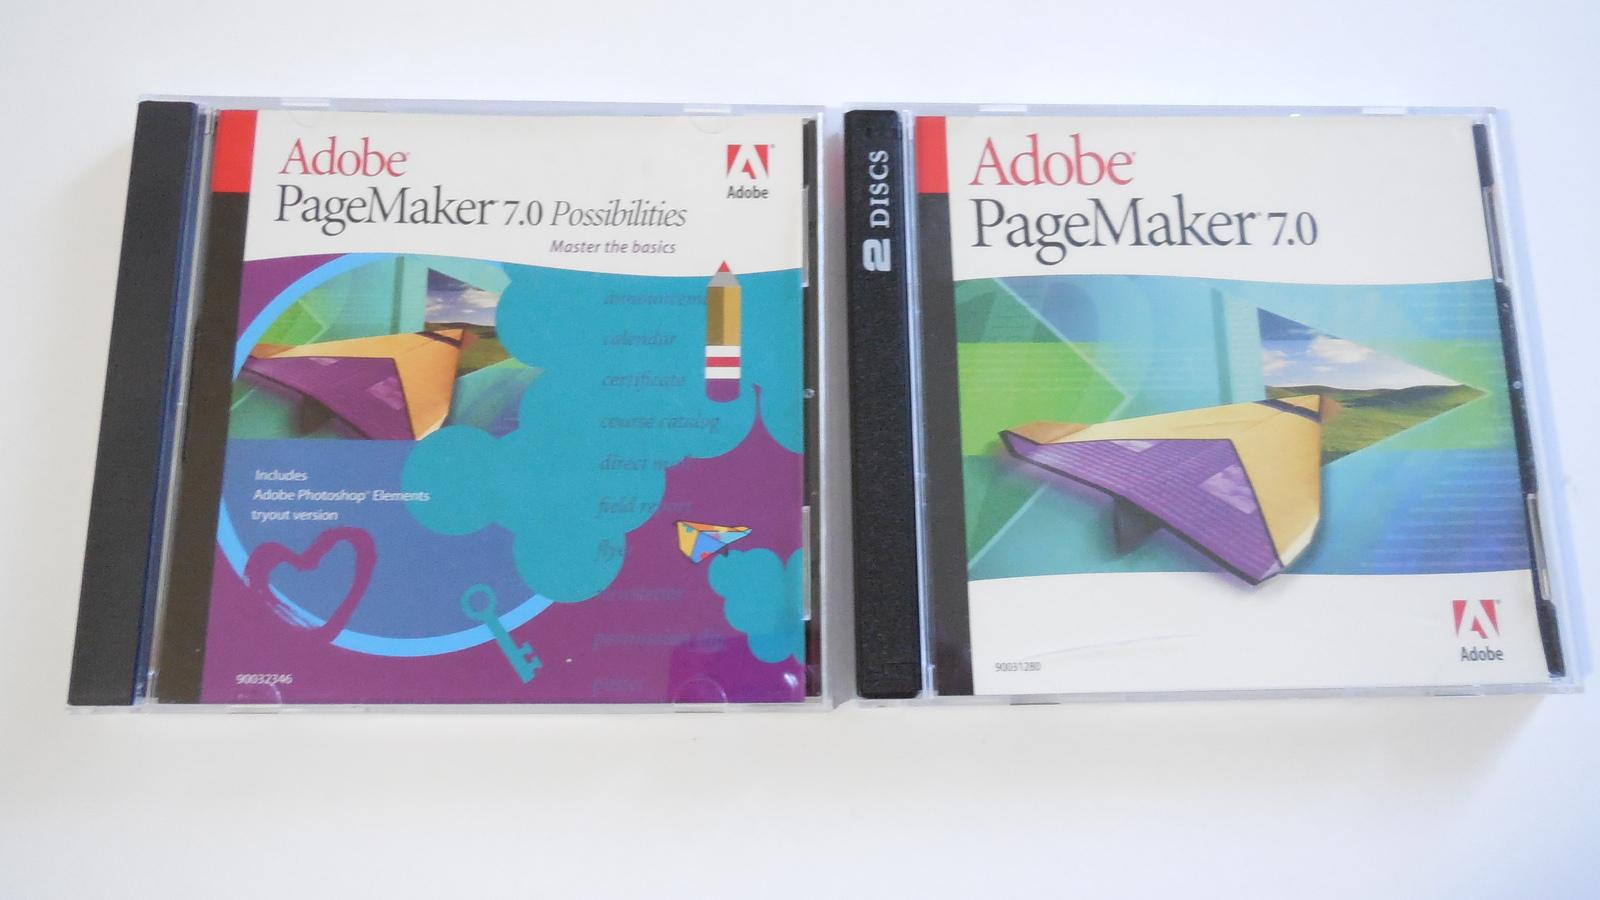 adobe pagemaker 7 0 windows education version includes key serial web desktop publishing. Black Bedroom Furniture Sets. Home Design Ideas